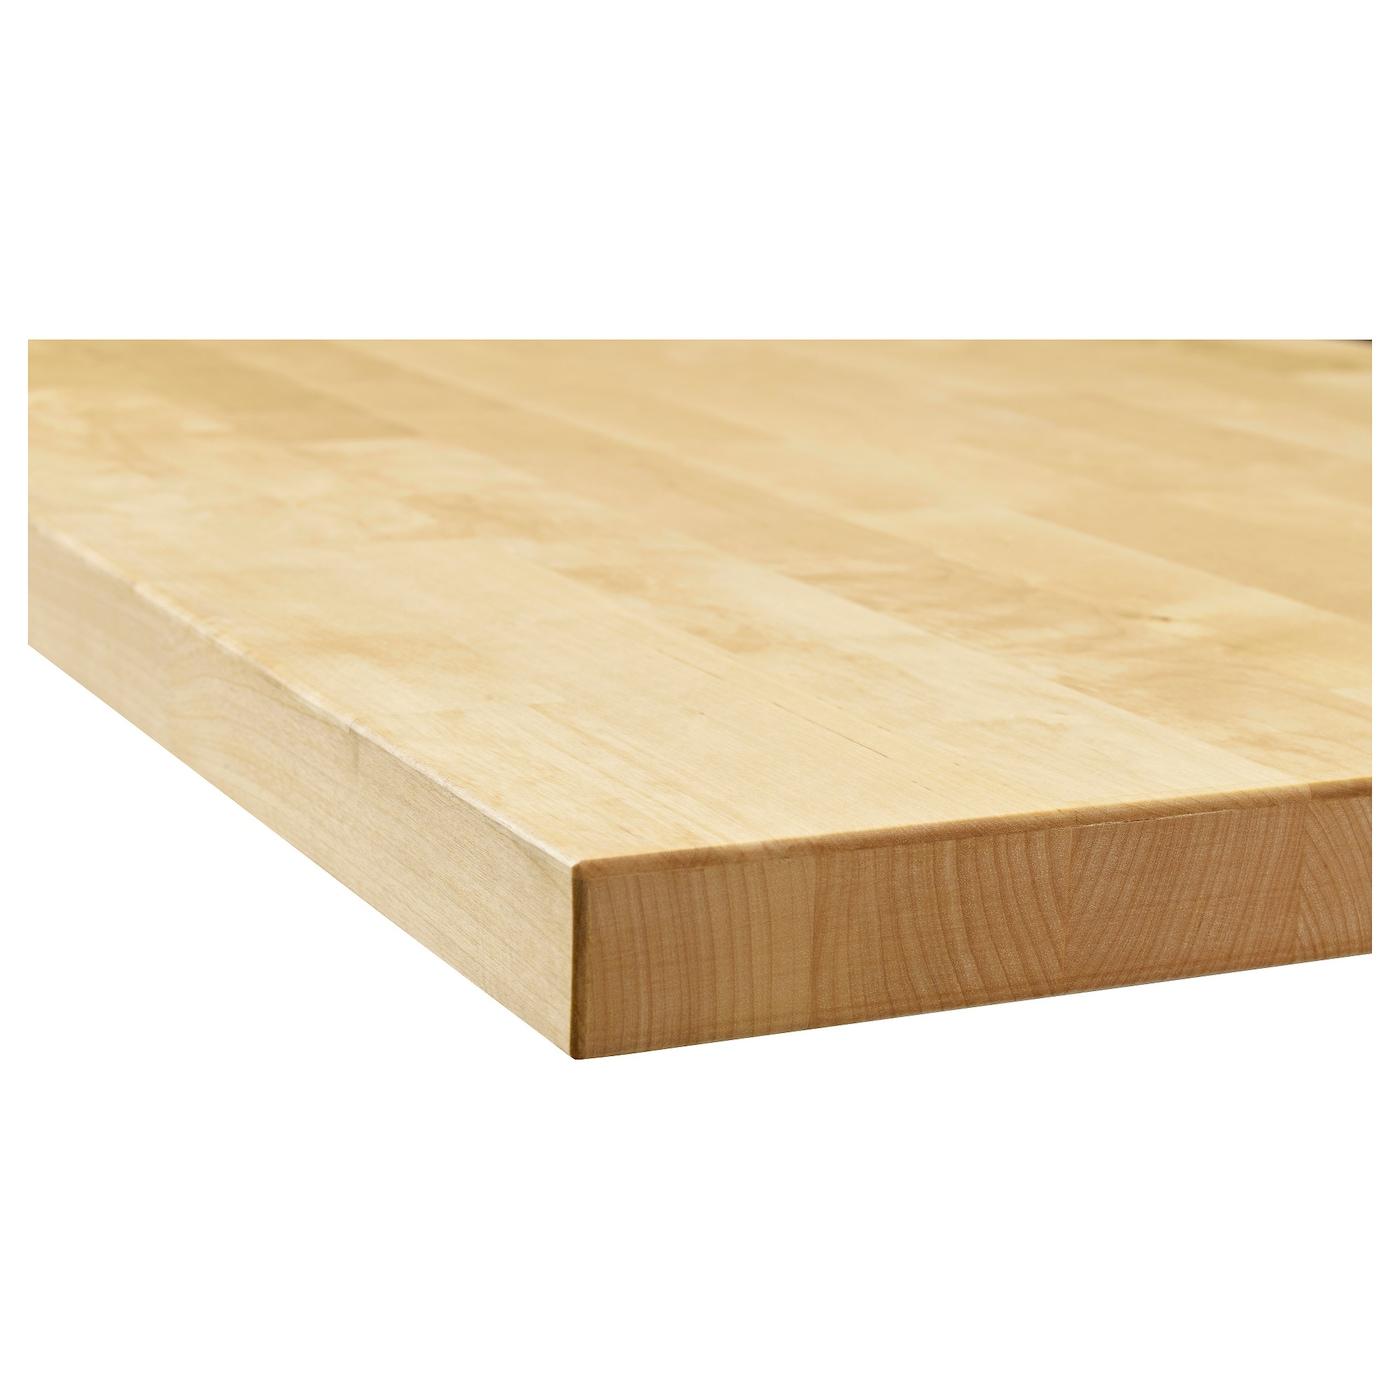 "KARLBY Countertop, birch/veneer, 74x1 1/2 """